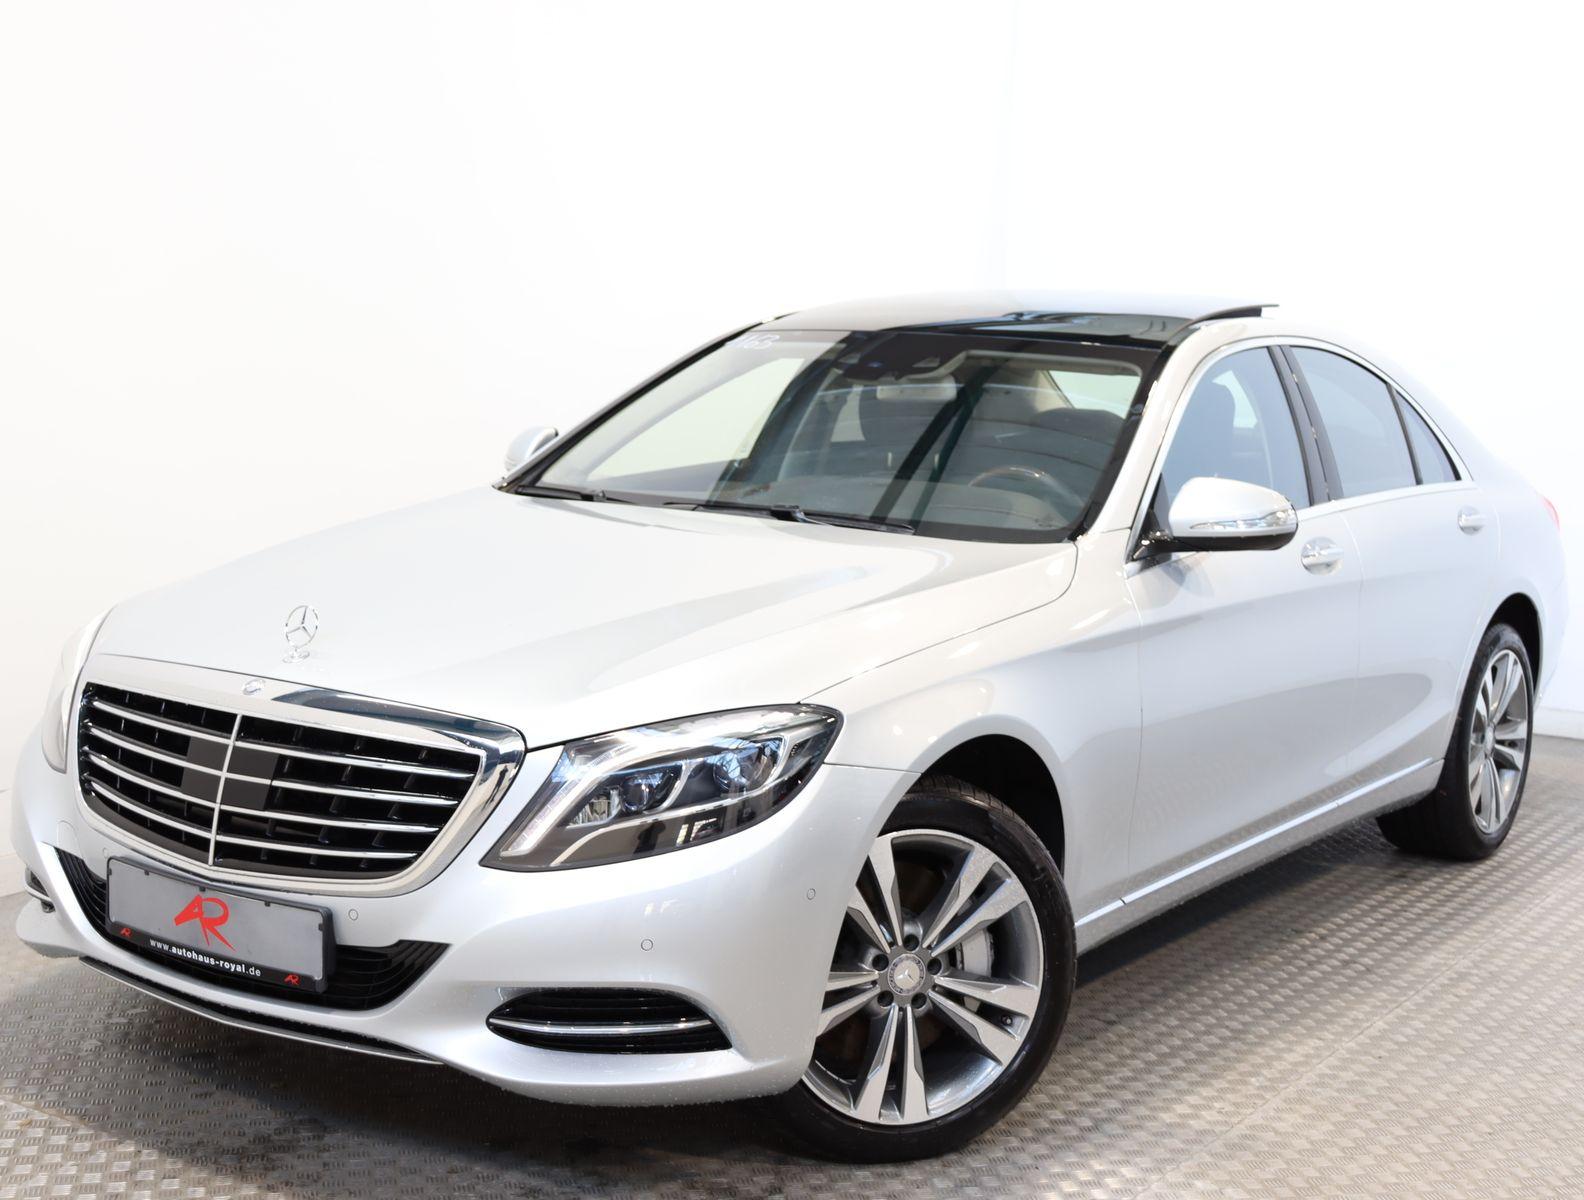 Mercedes-Benz S 500 4M PANORAMA,MEMORY,DISTRO,KAMERA,KEYLESS, Jahr 2014, Benzin